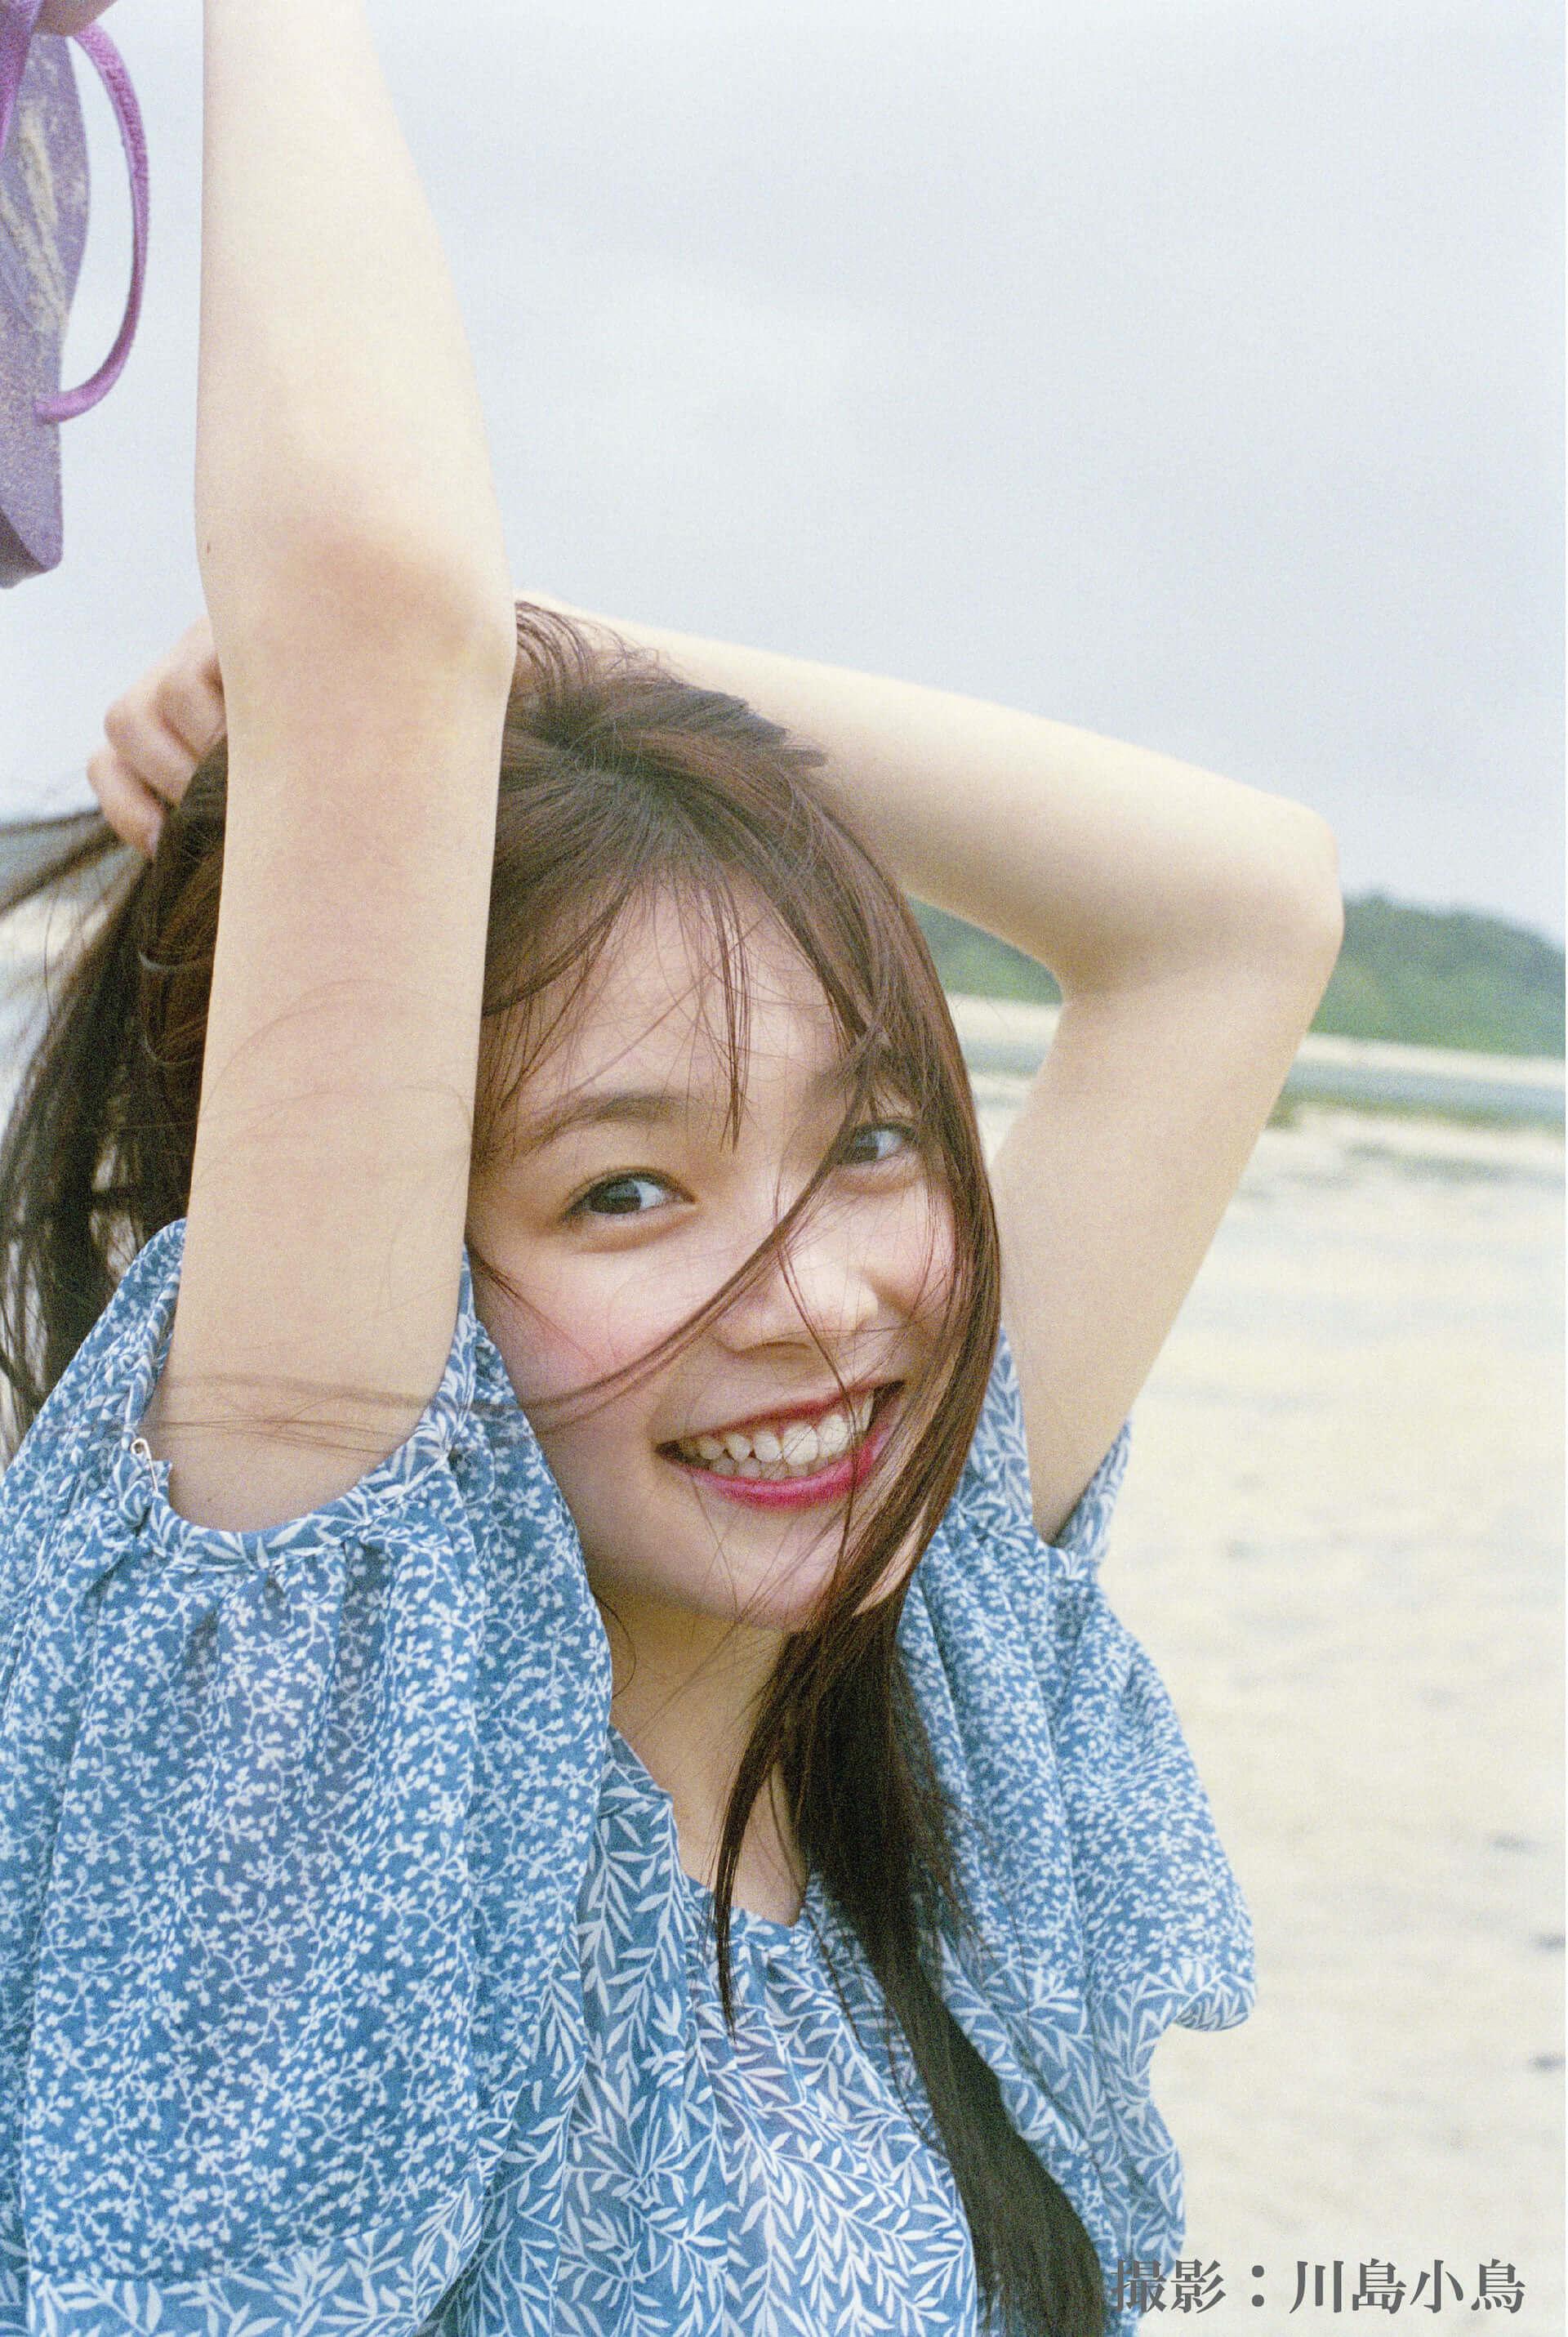 Seventeen専属モデル・久間田琳加の10代ラストに初の写真集&スタイルブックが同時発売決定! life200401_rinka_kumada_7-1920x2861